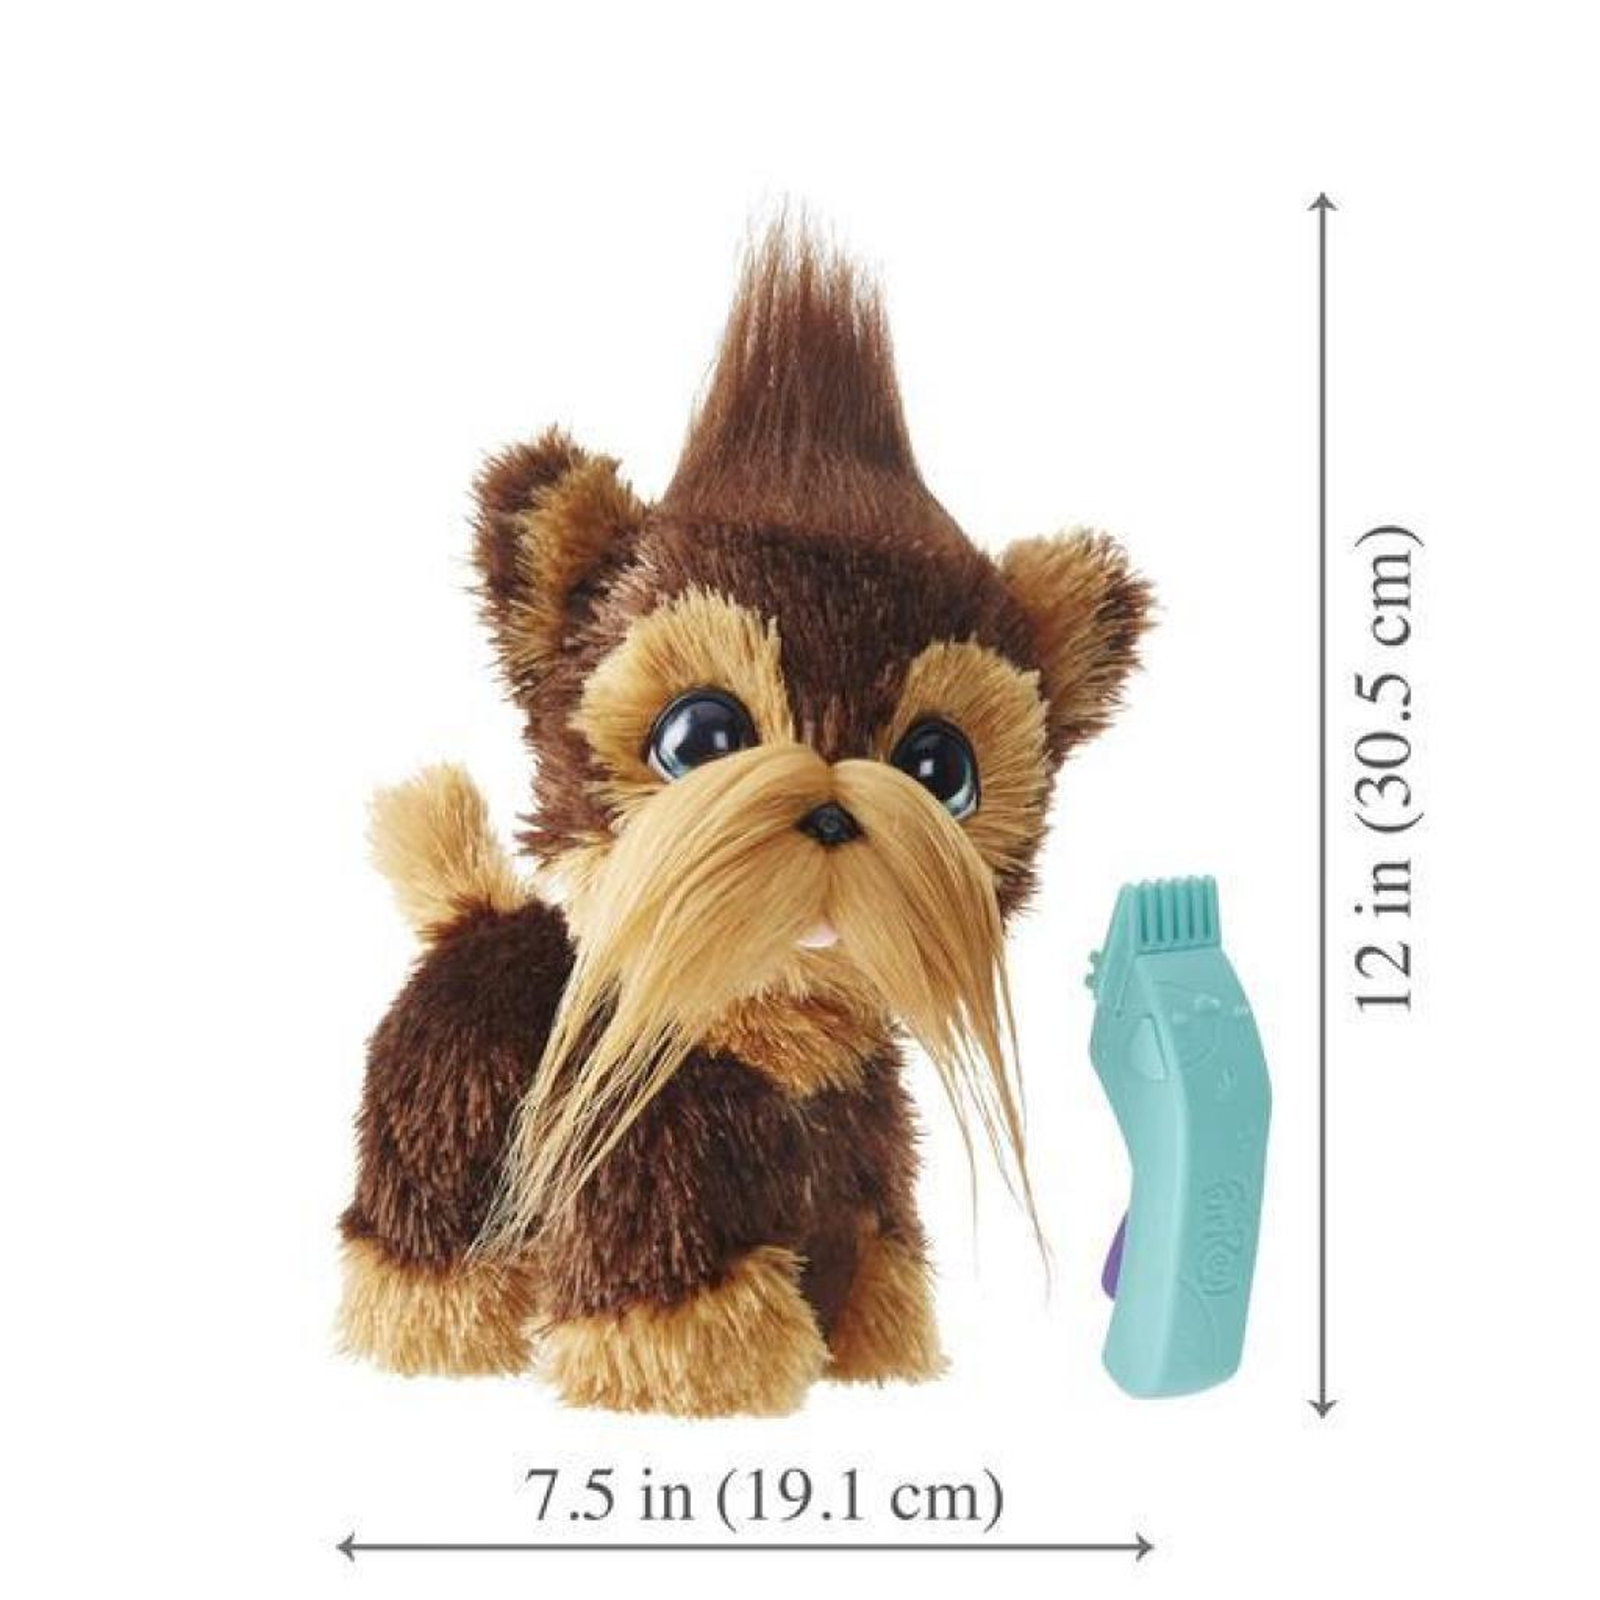 Интерактивная игрушка Hasbro Furreal Friends Лохматый Пёс (E0497) изображение 3